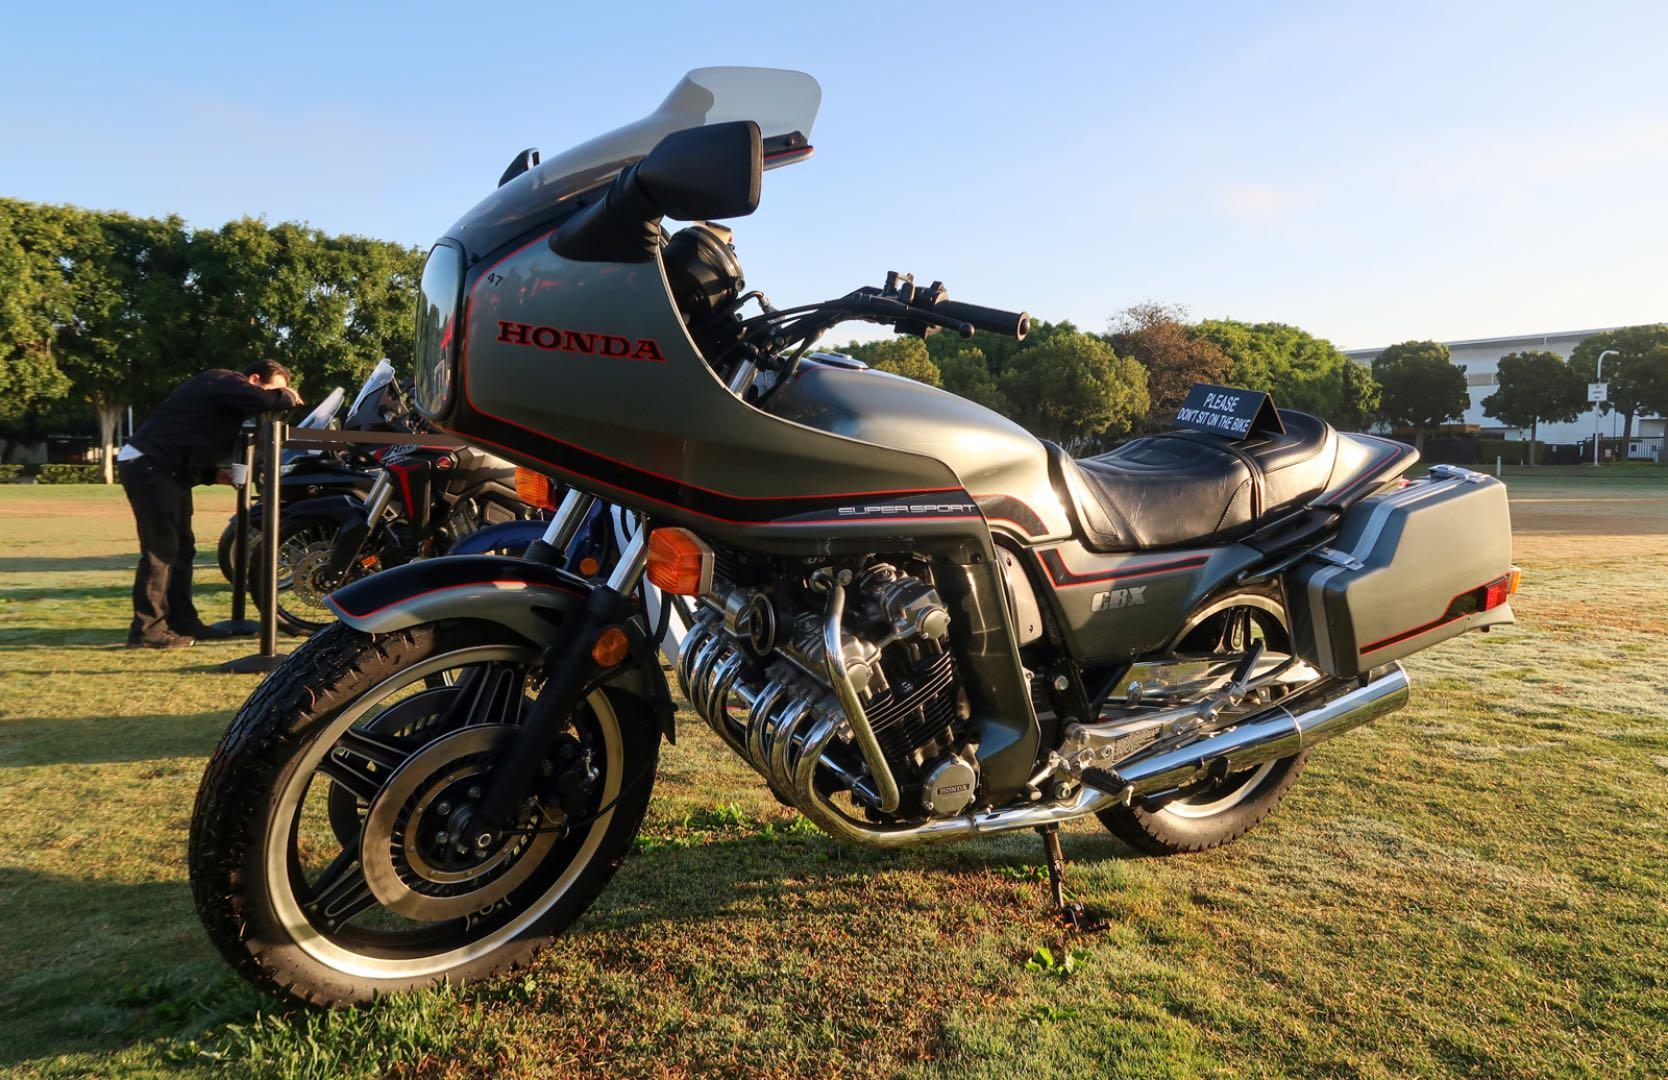 1981 Honda CBX on auction